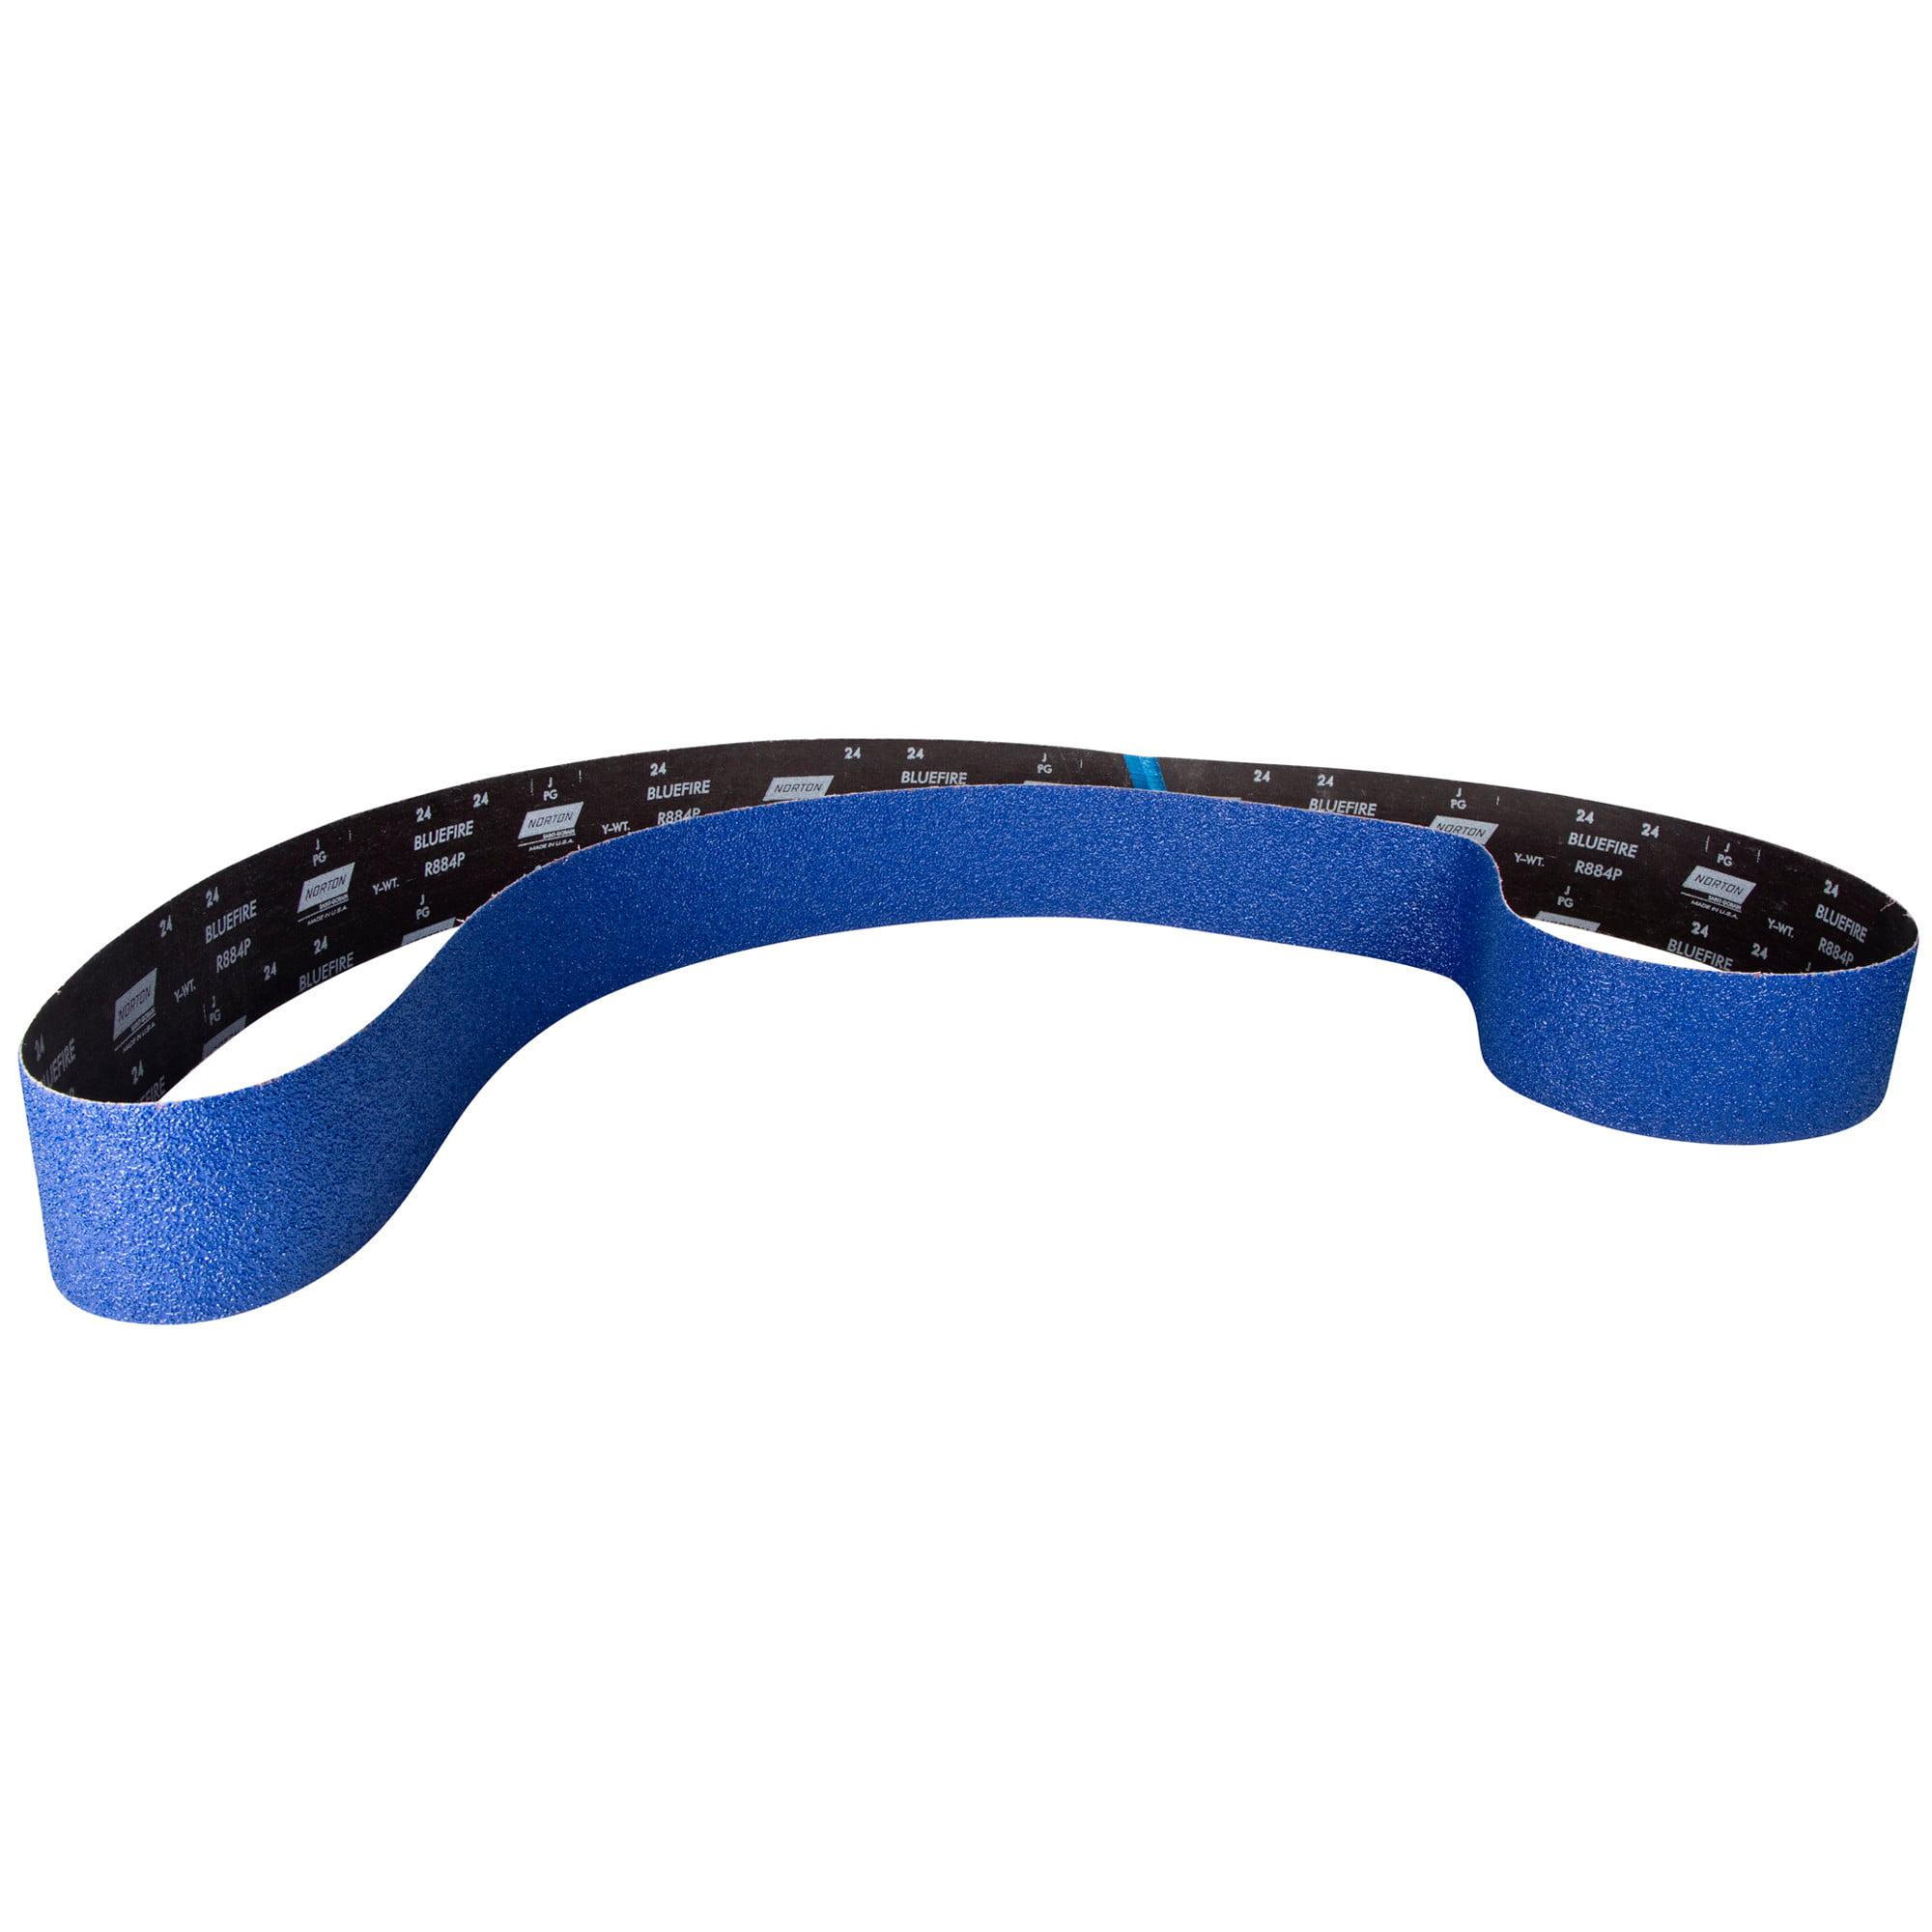 Norton 78072760469 Sander Belts Size 6 x 79 40-Y Grit